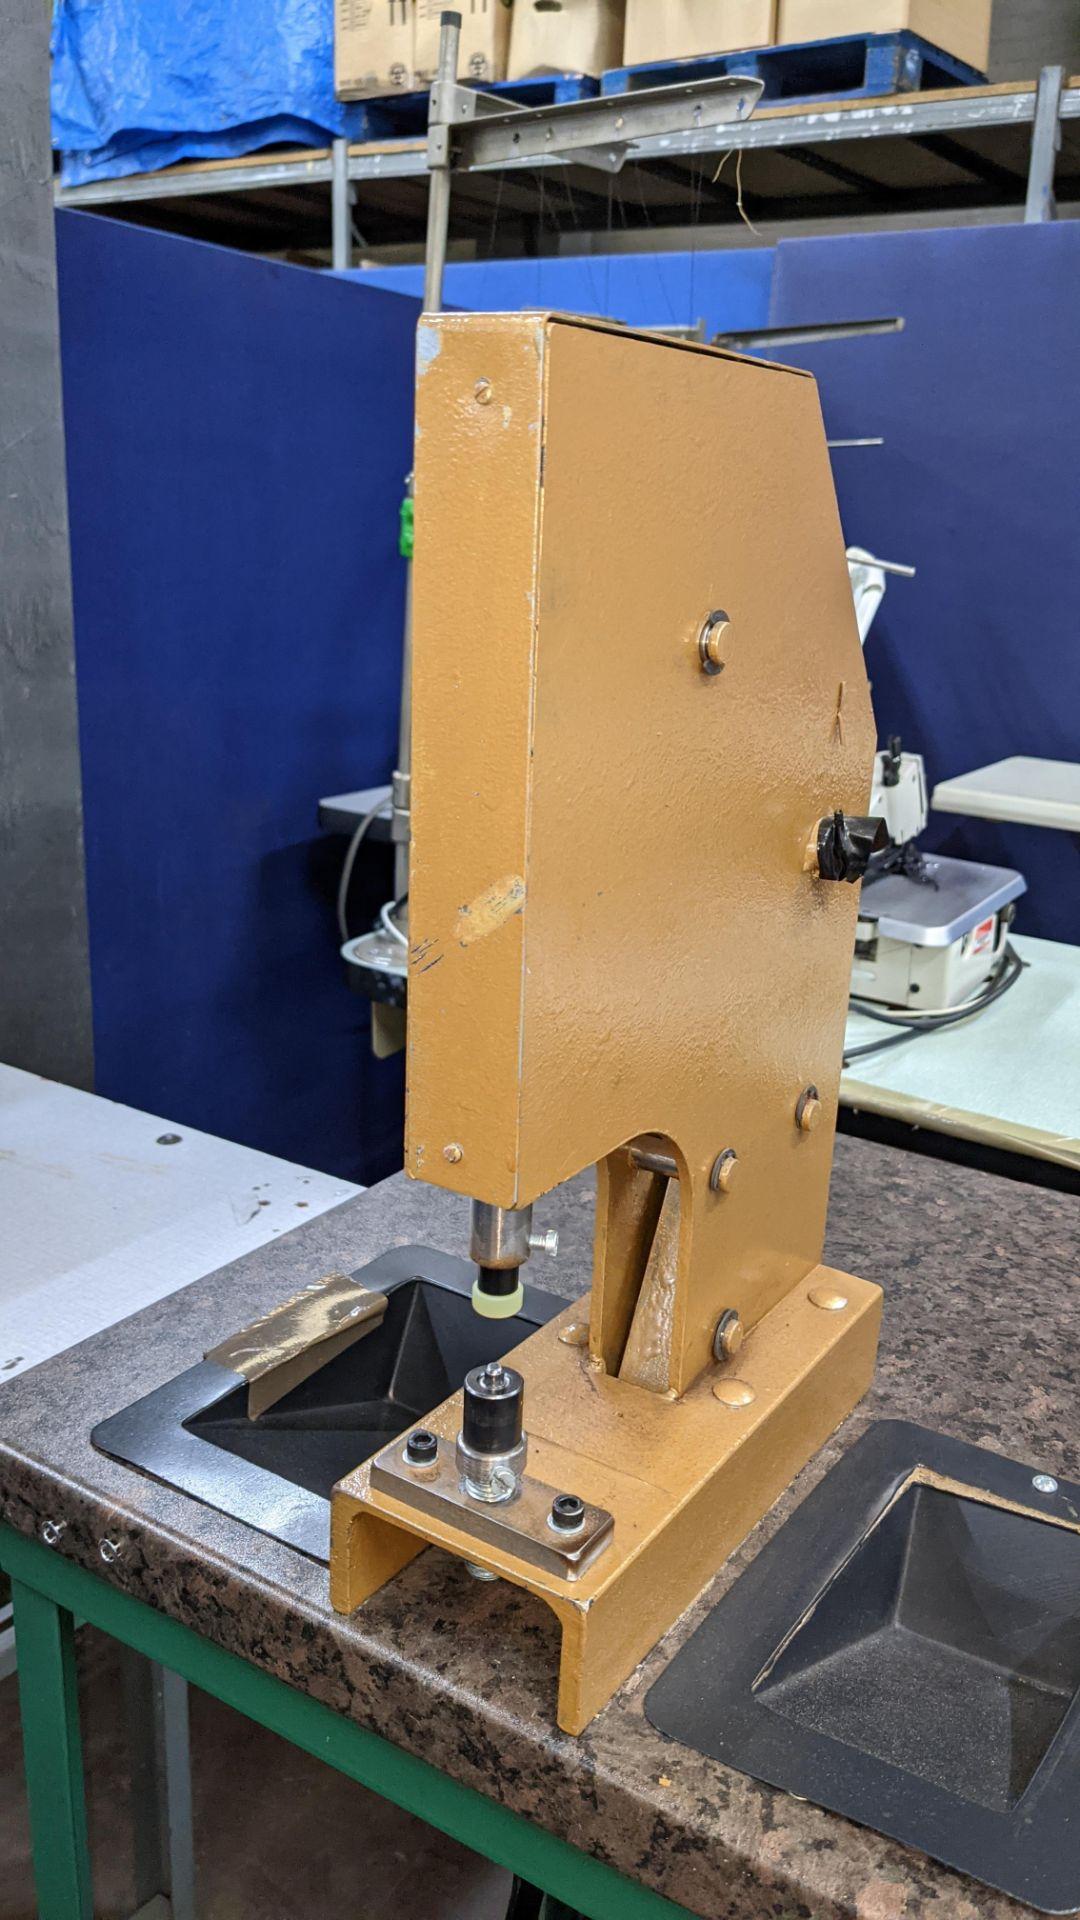 Foot operated riveting machine/press stud machine - Image 4 of 9